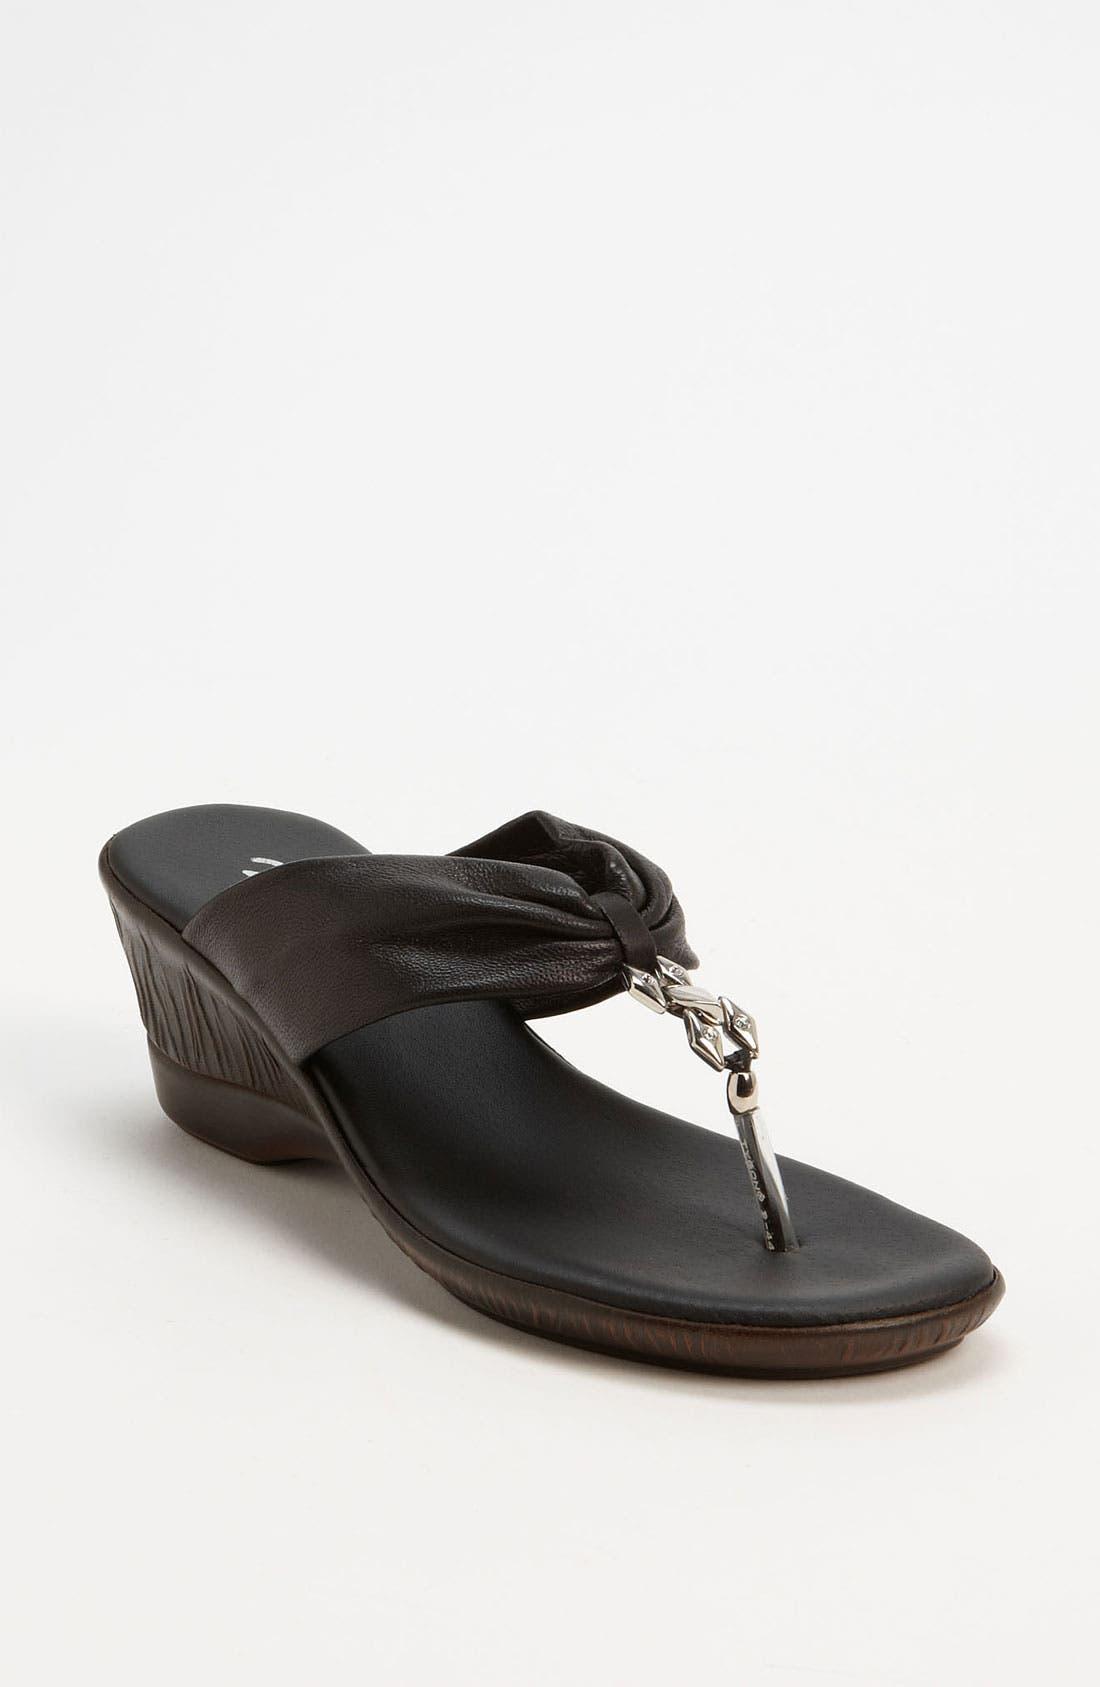 Alternate Image 1 Selected - Onex 'Jessie' Sandal